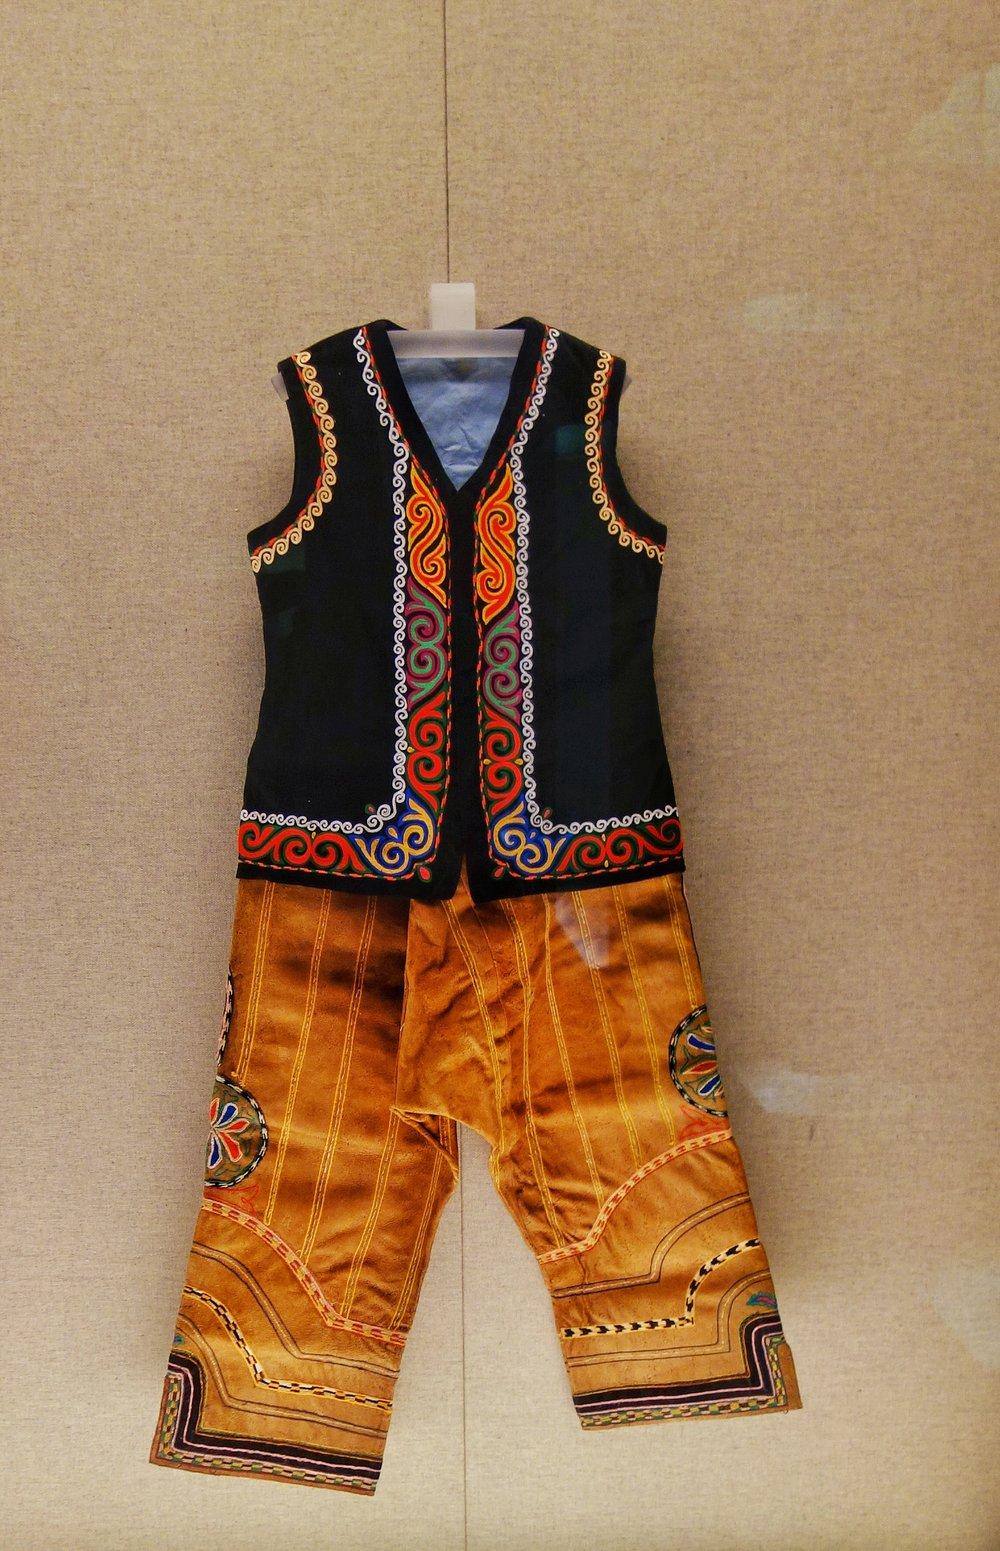 Kirkhiz Waistcoat and Pants